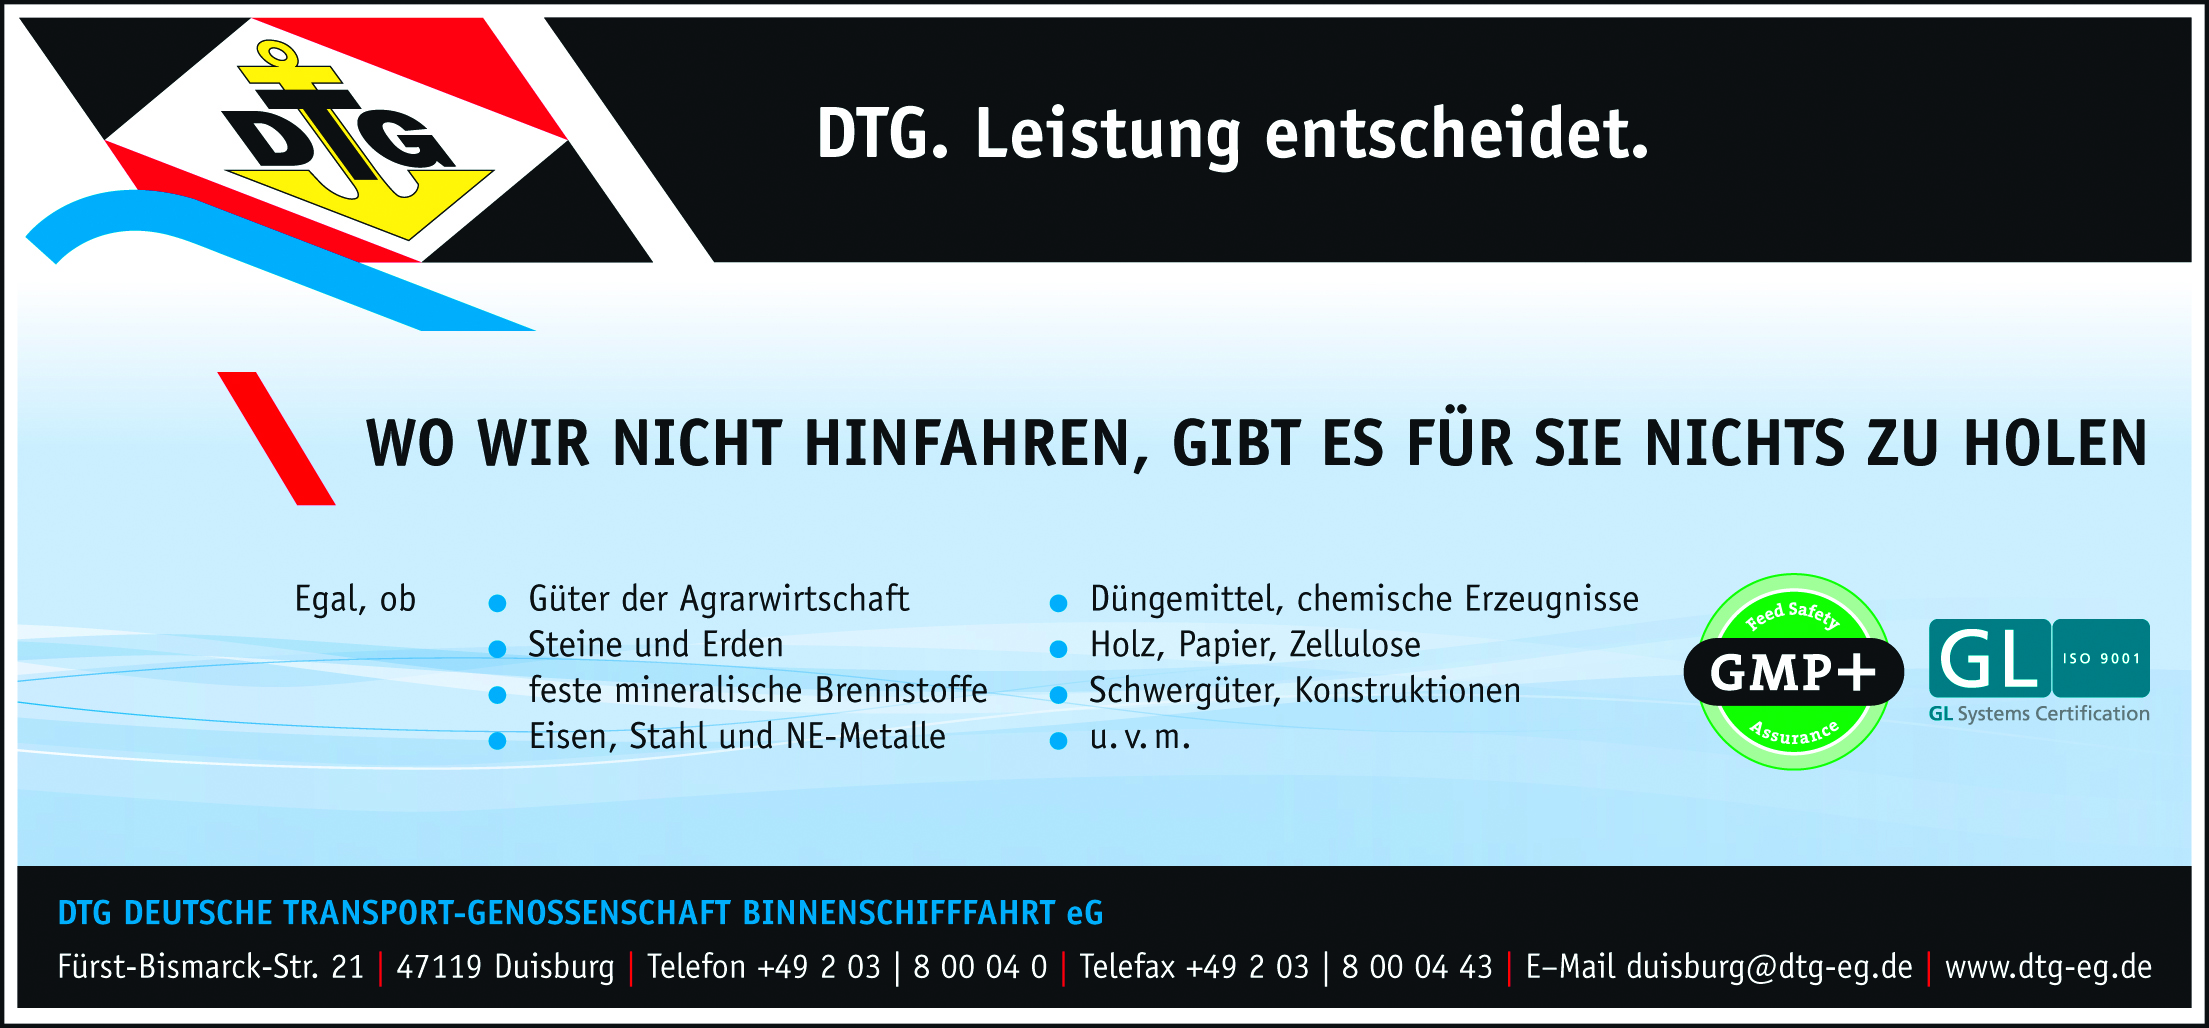 AZ_DTG_Futtermittel_187x87_4c.indd